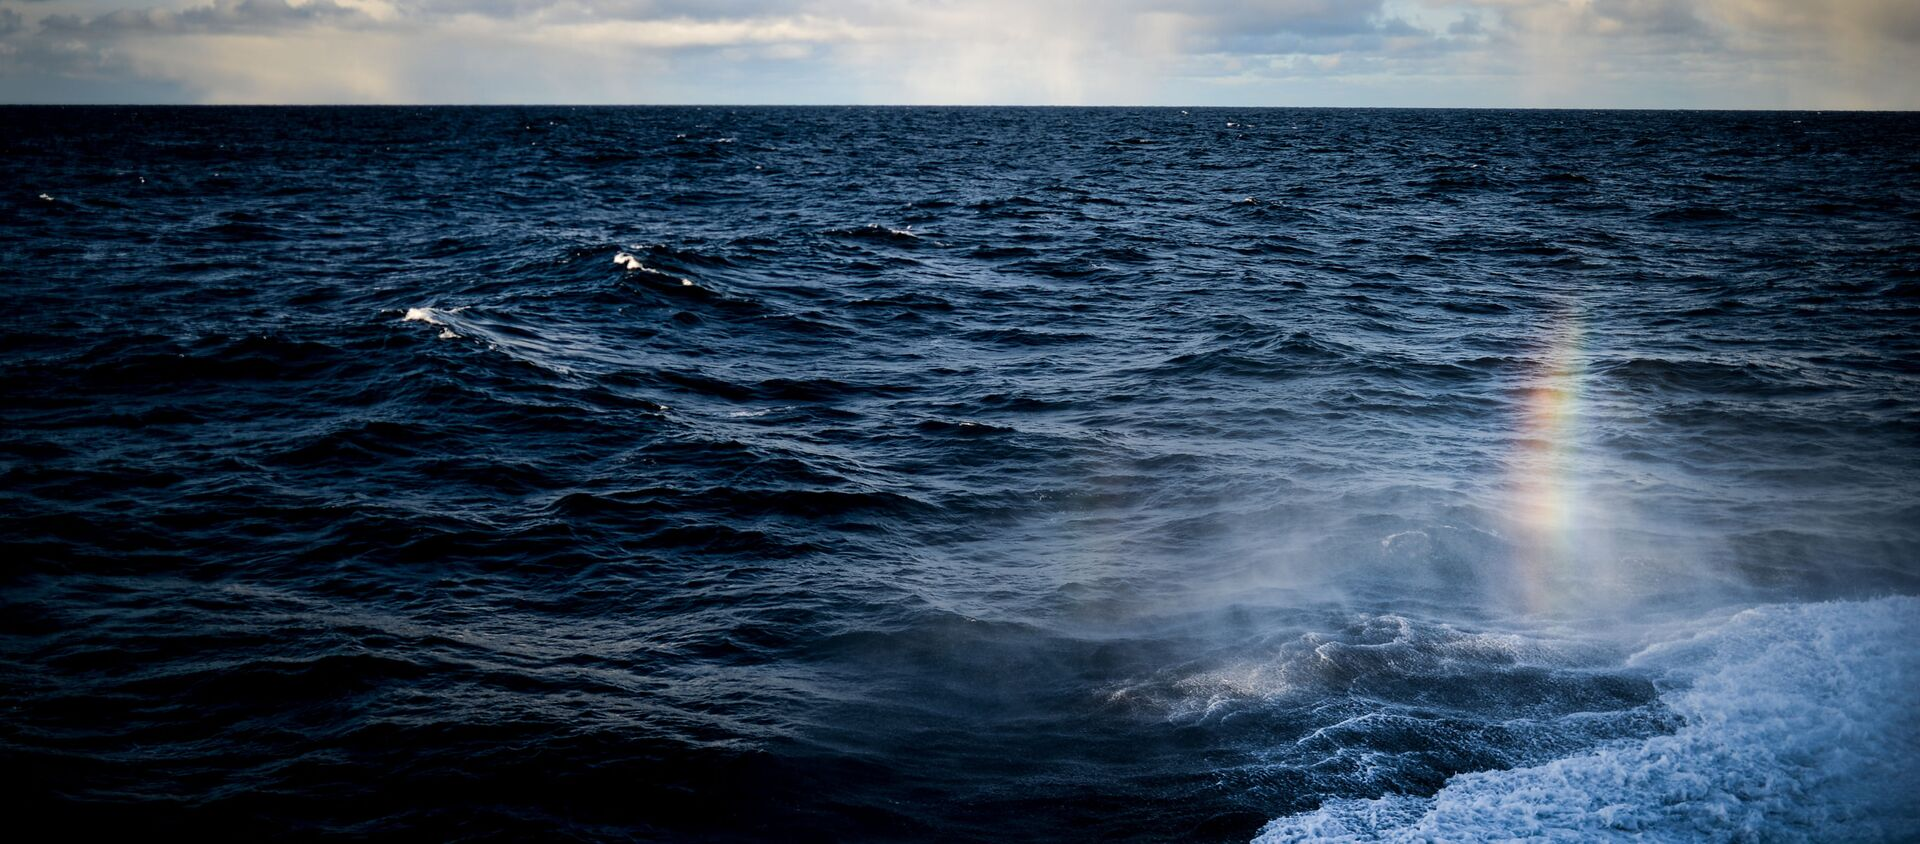 Morze Barentsa - Sputnik Polska, 1920, 06.02.2021